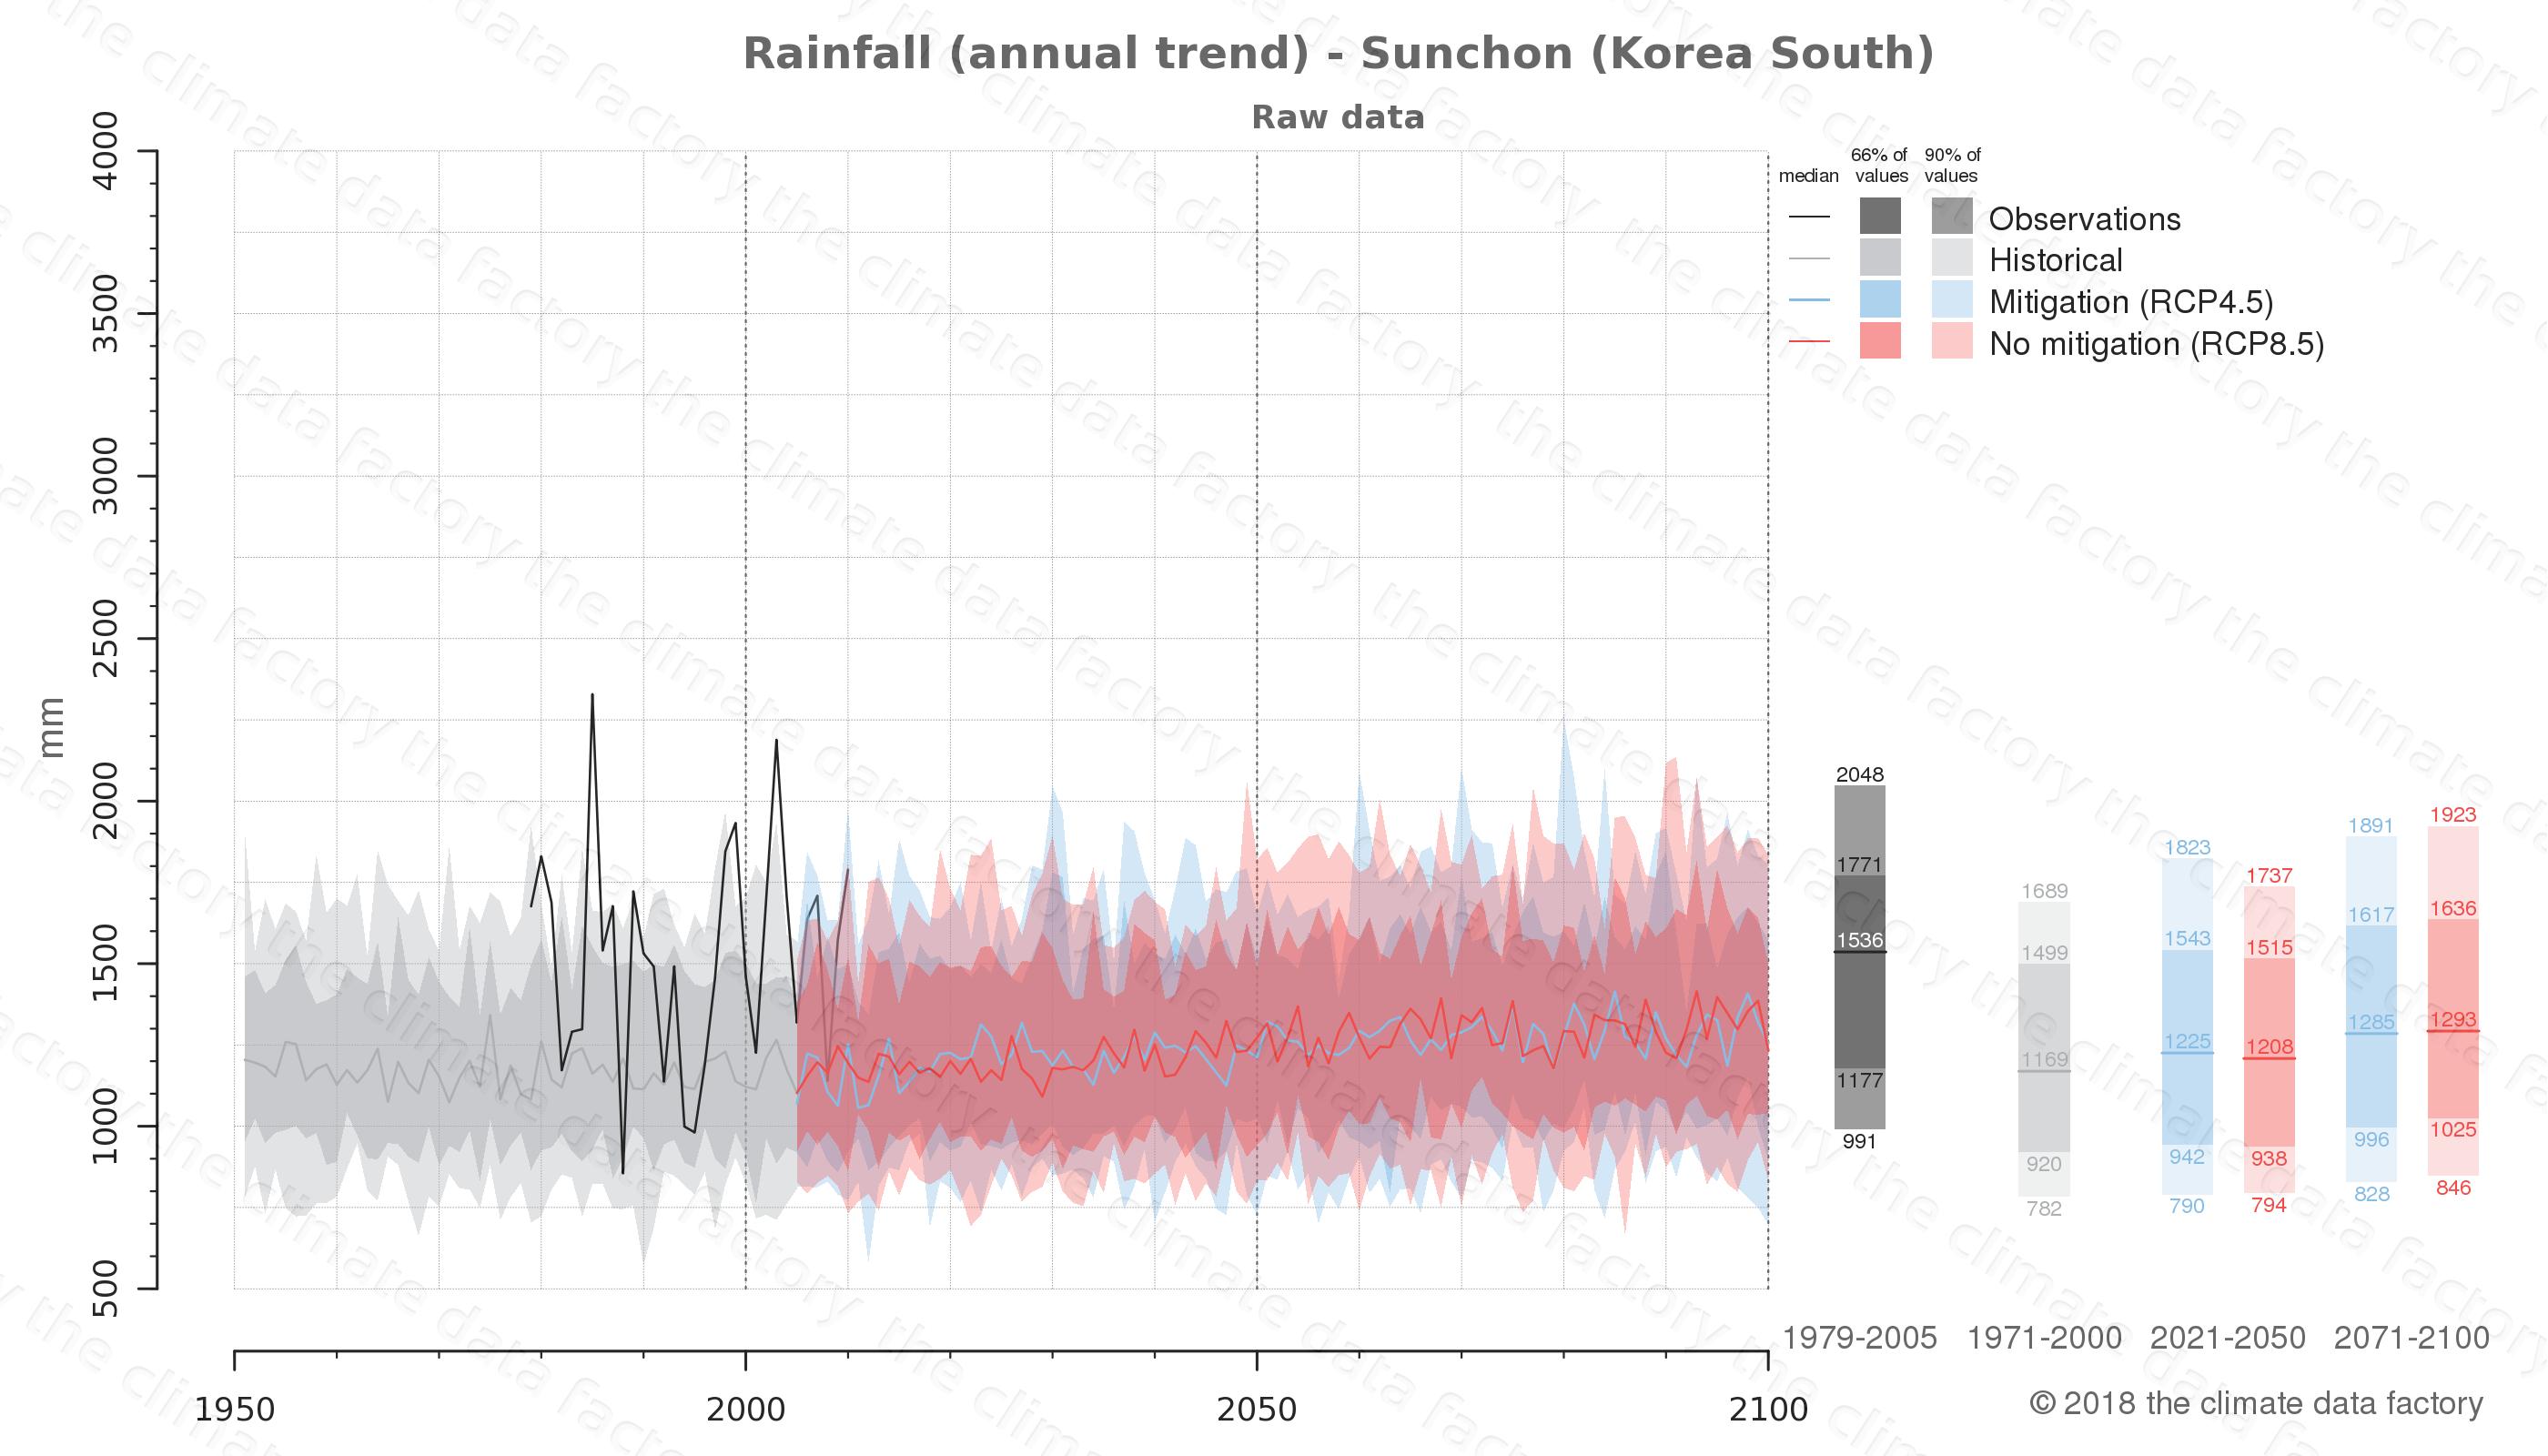 climate change data policy adaptation climate graph city data rainfall sunchon south korea